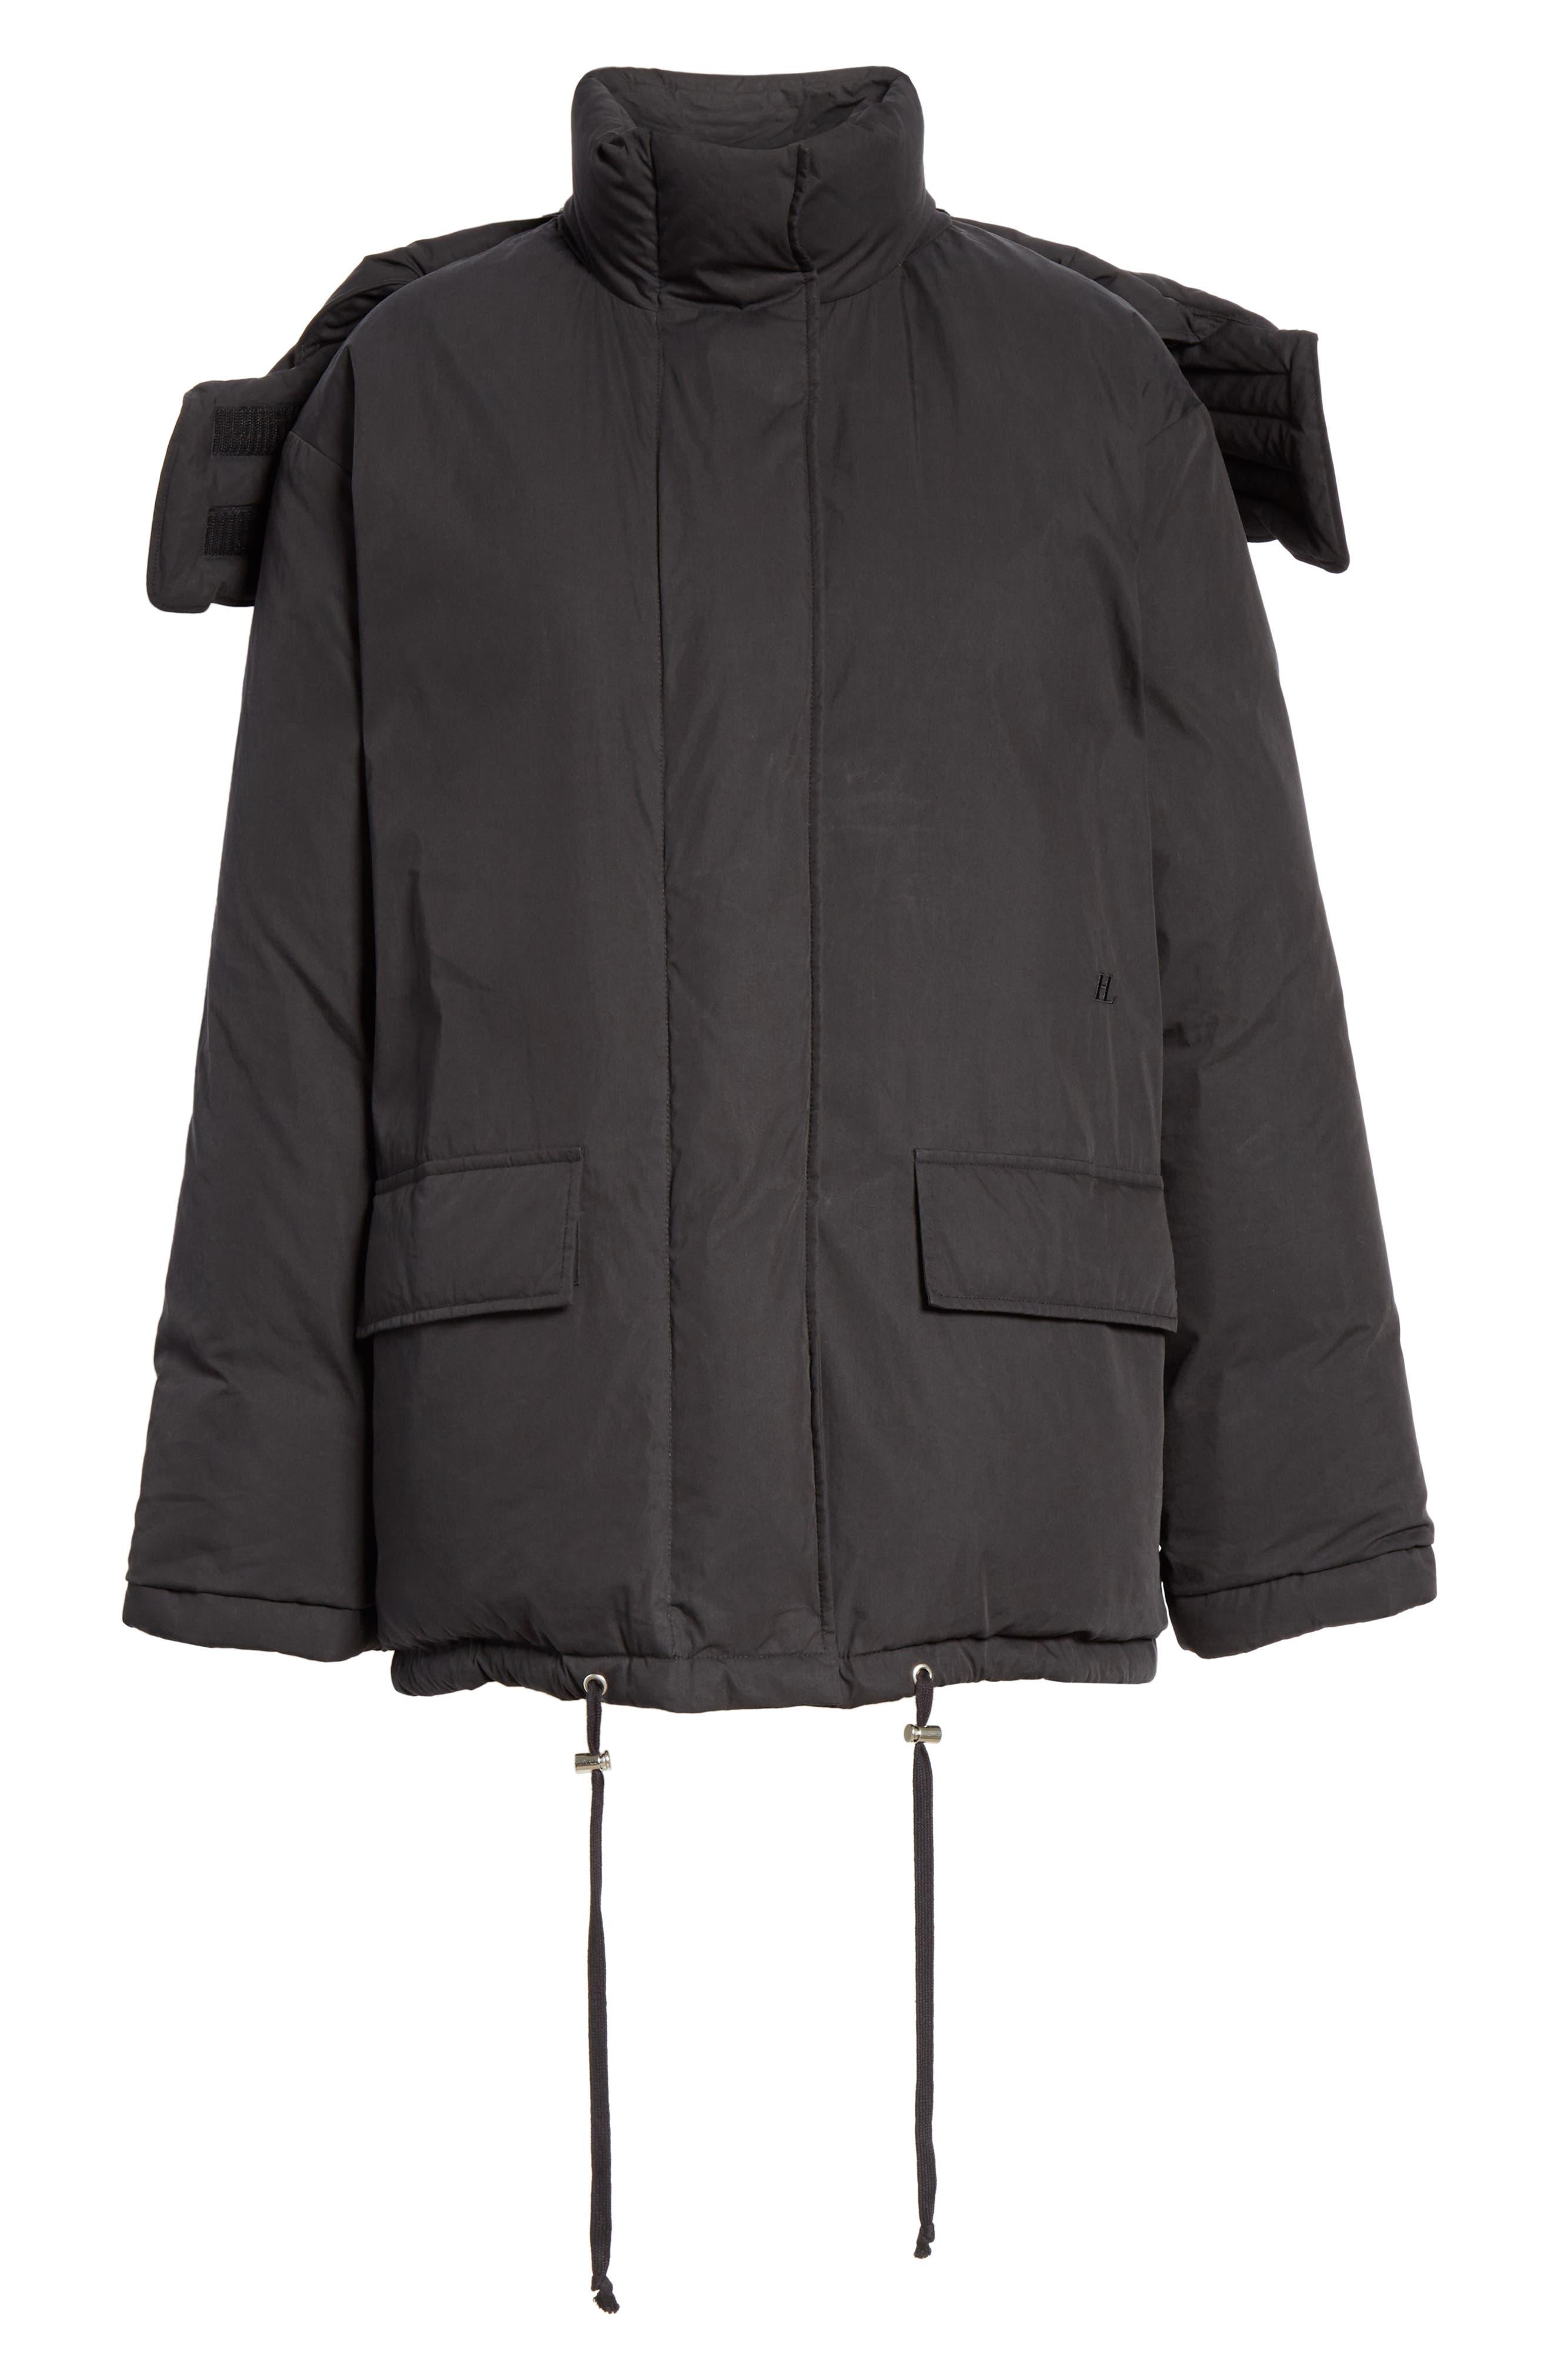 HELMUT LANG, Removable Hood Puffer Jacket, Alternate thumbnail 7, color, 001